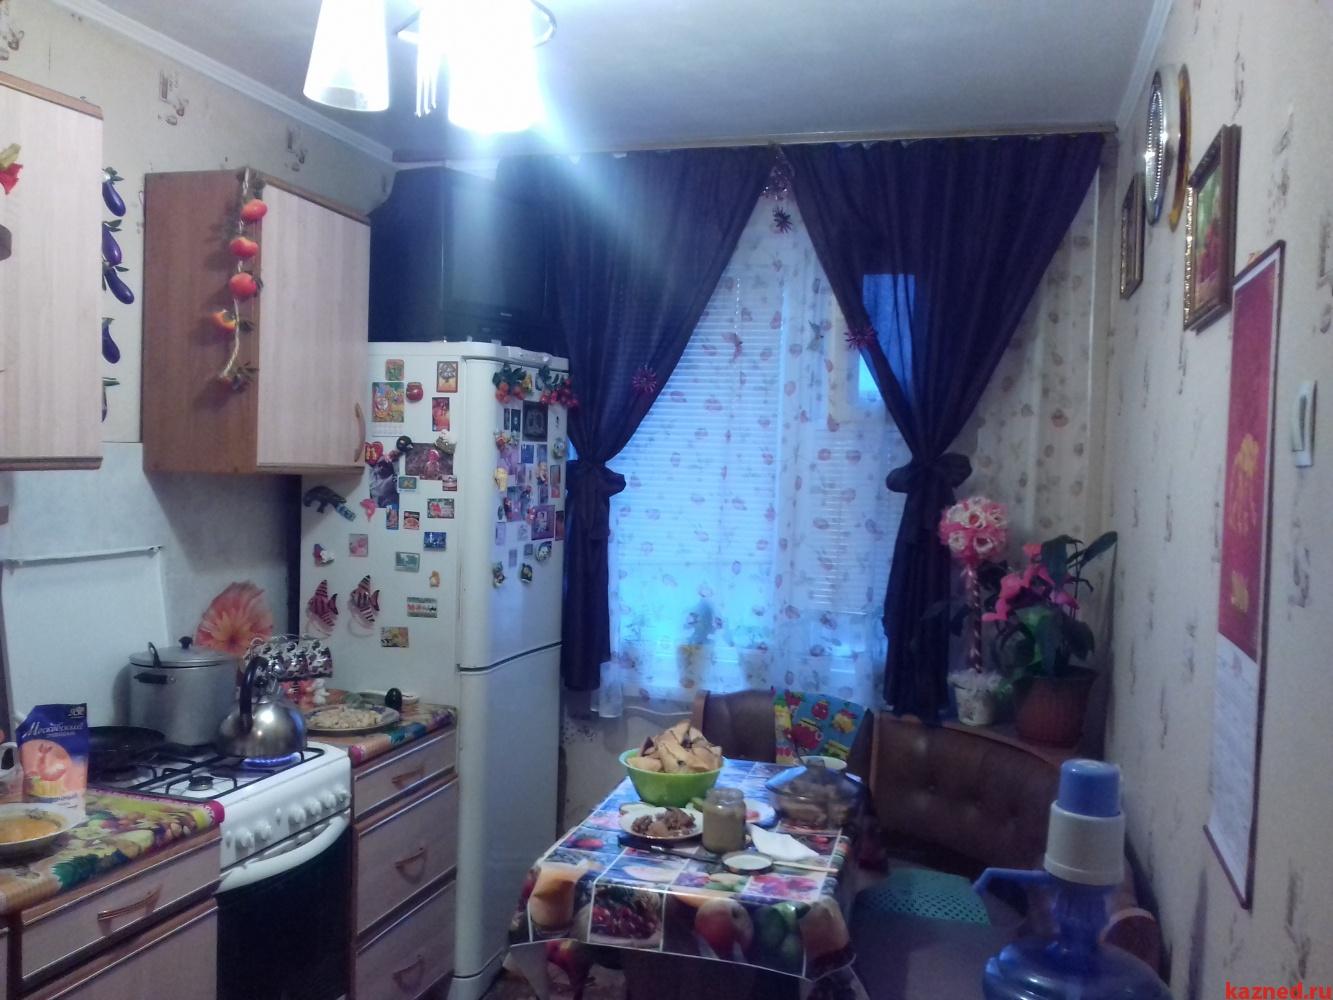 Продажа 3-к квартиры Фучика, 133, 68 м2  (миниатюра №2)